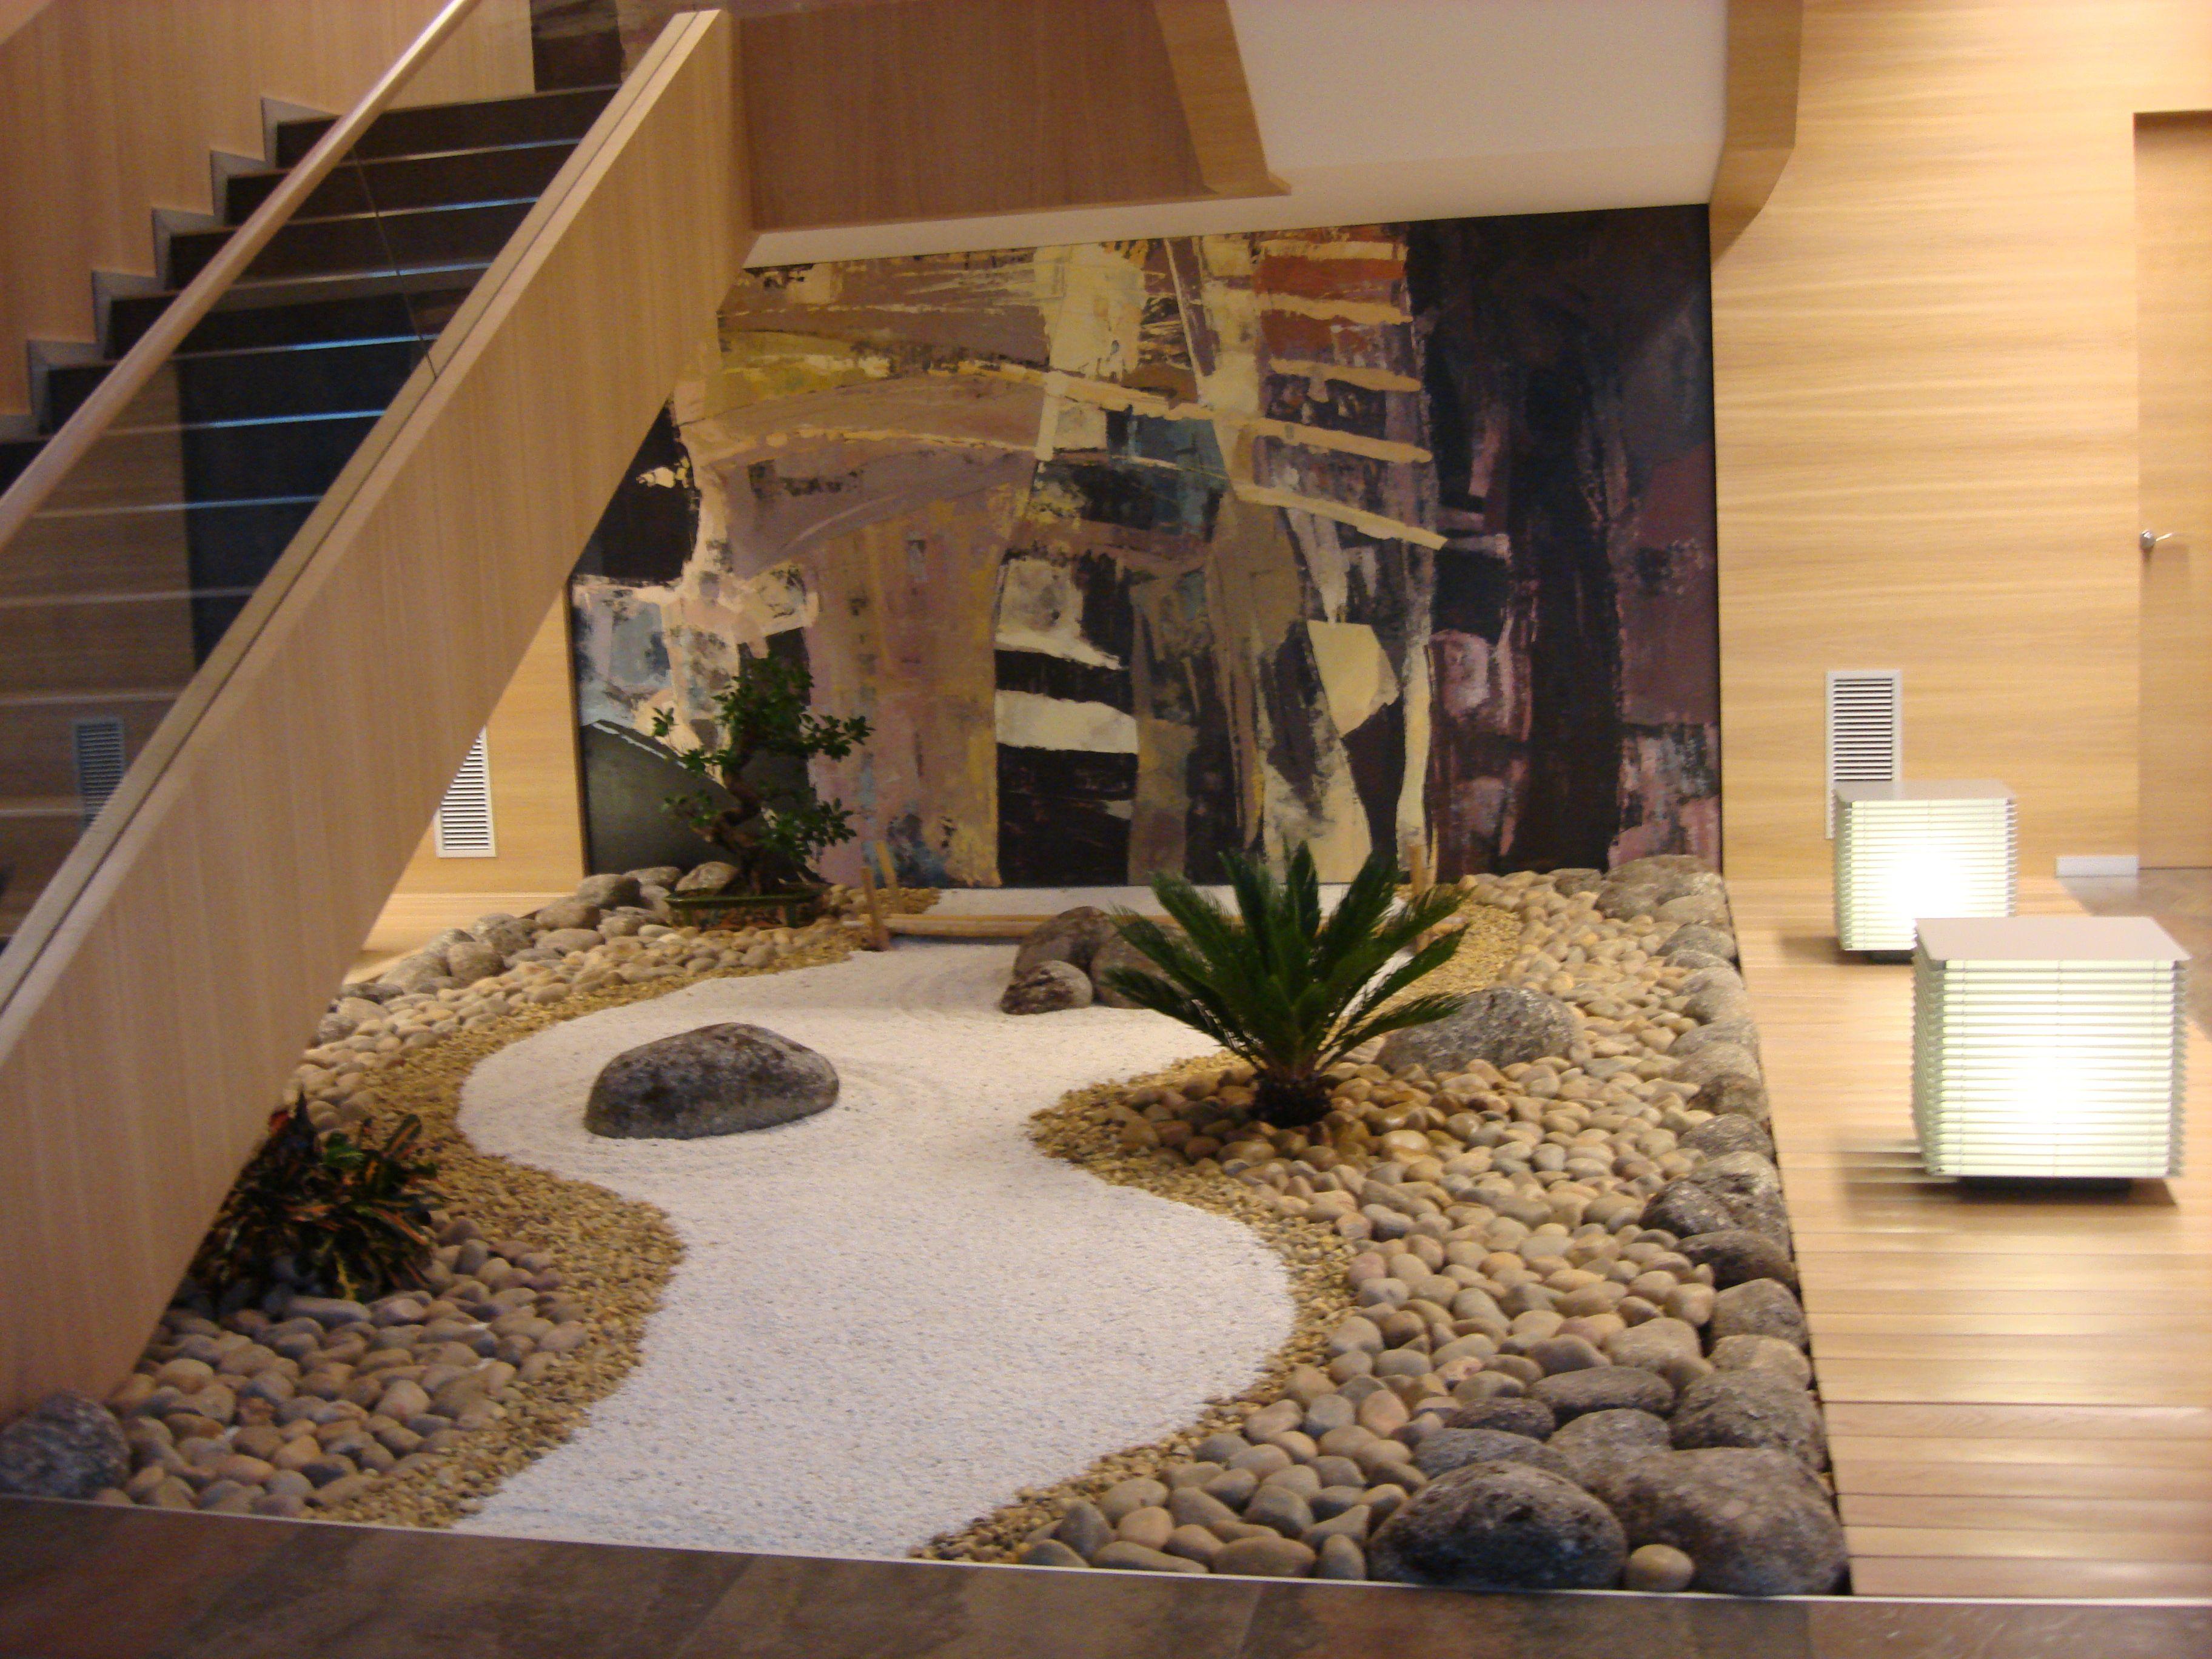 Jardines japoneses de interior inspiraci n de dise o de for Interiores de diseño